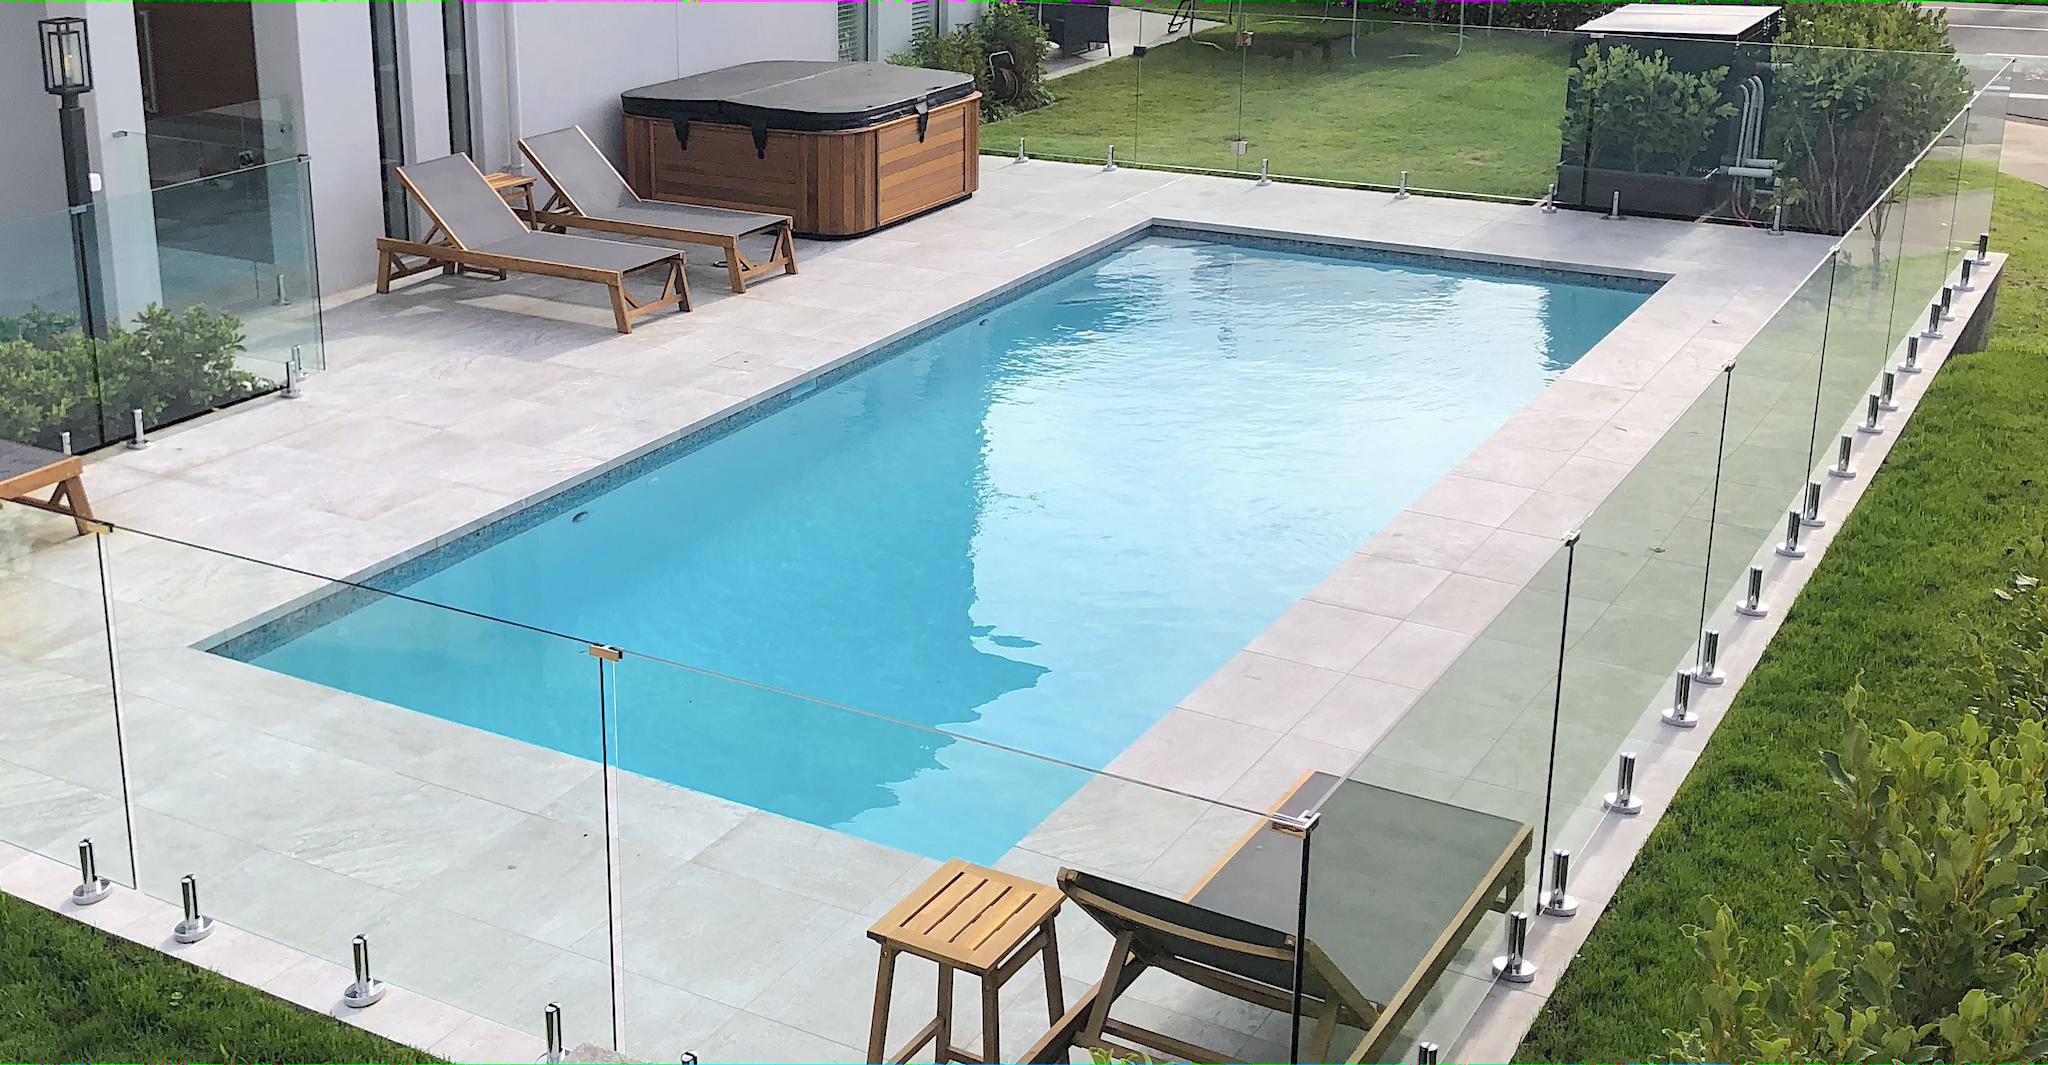 9x3.5m pool by Mobius Pools